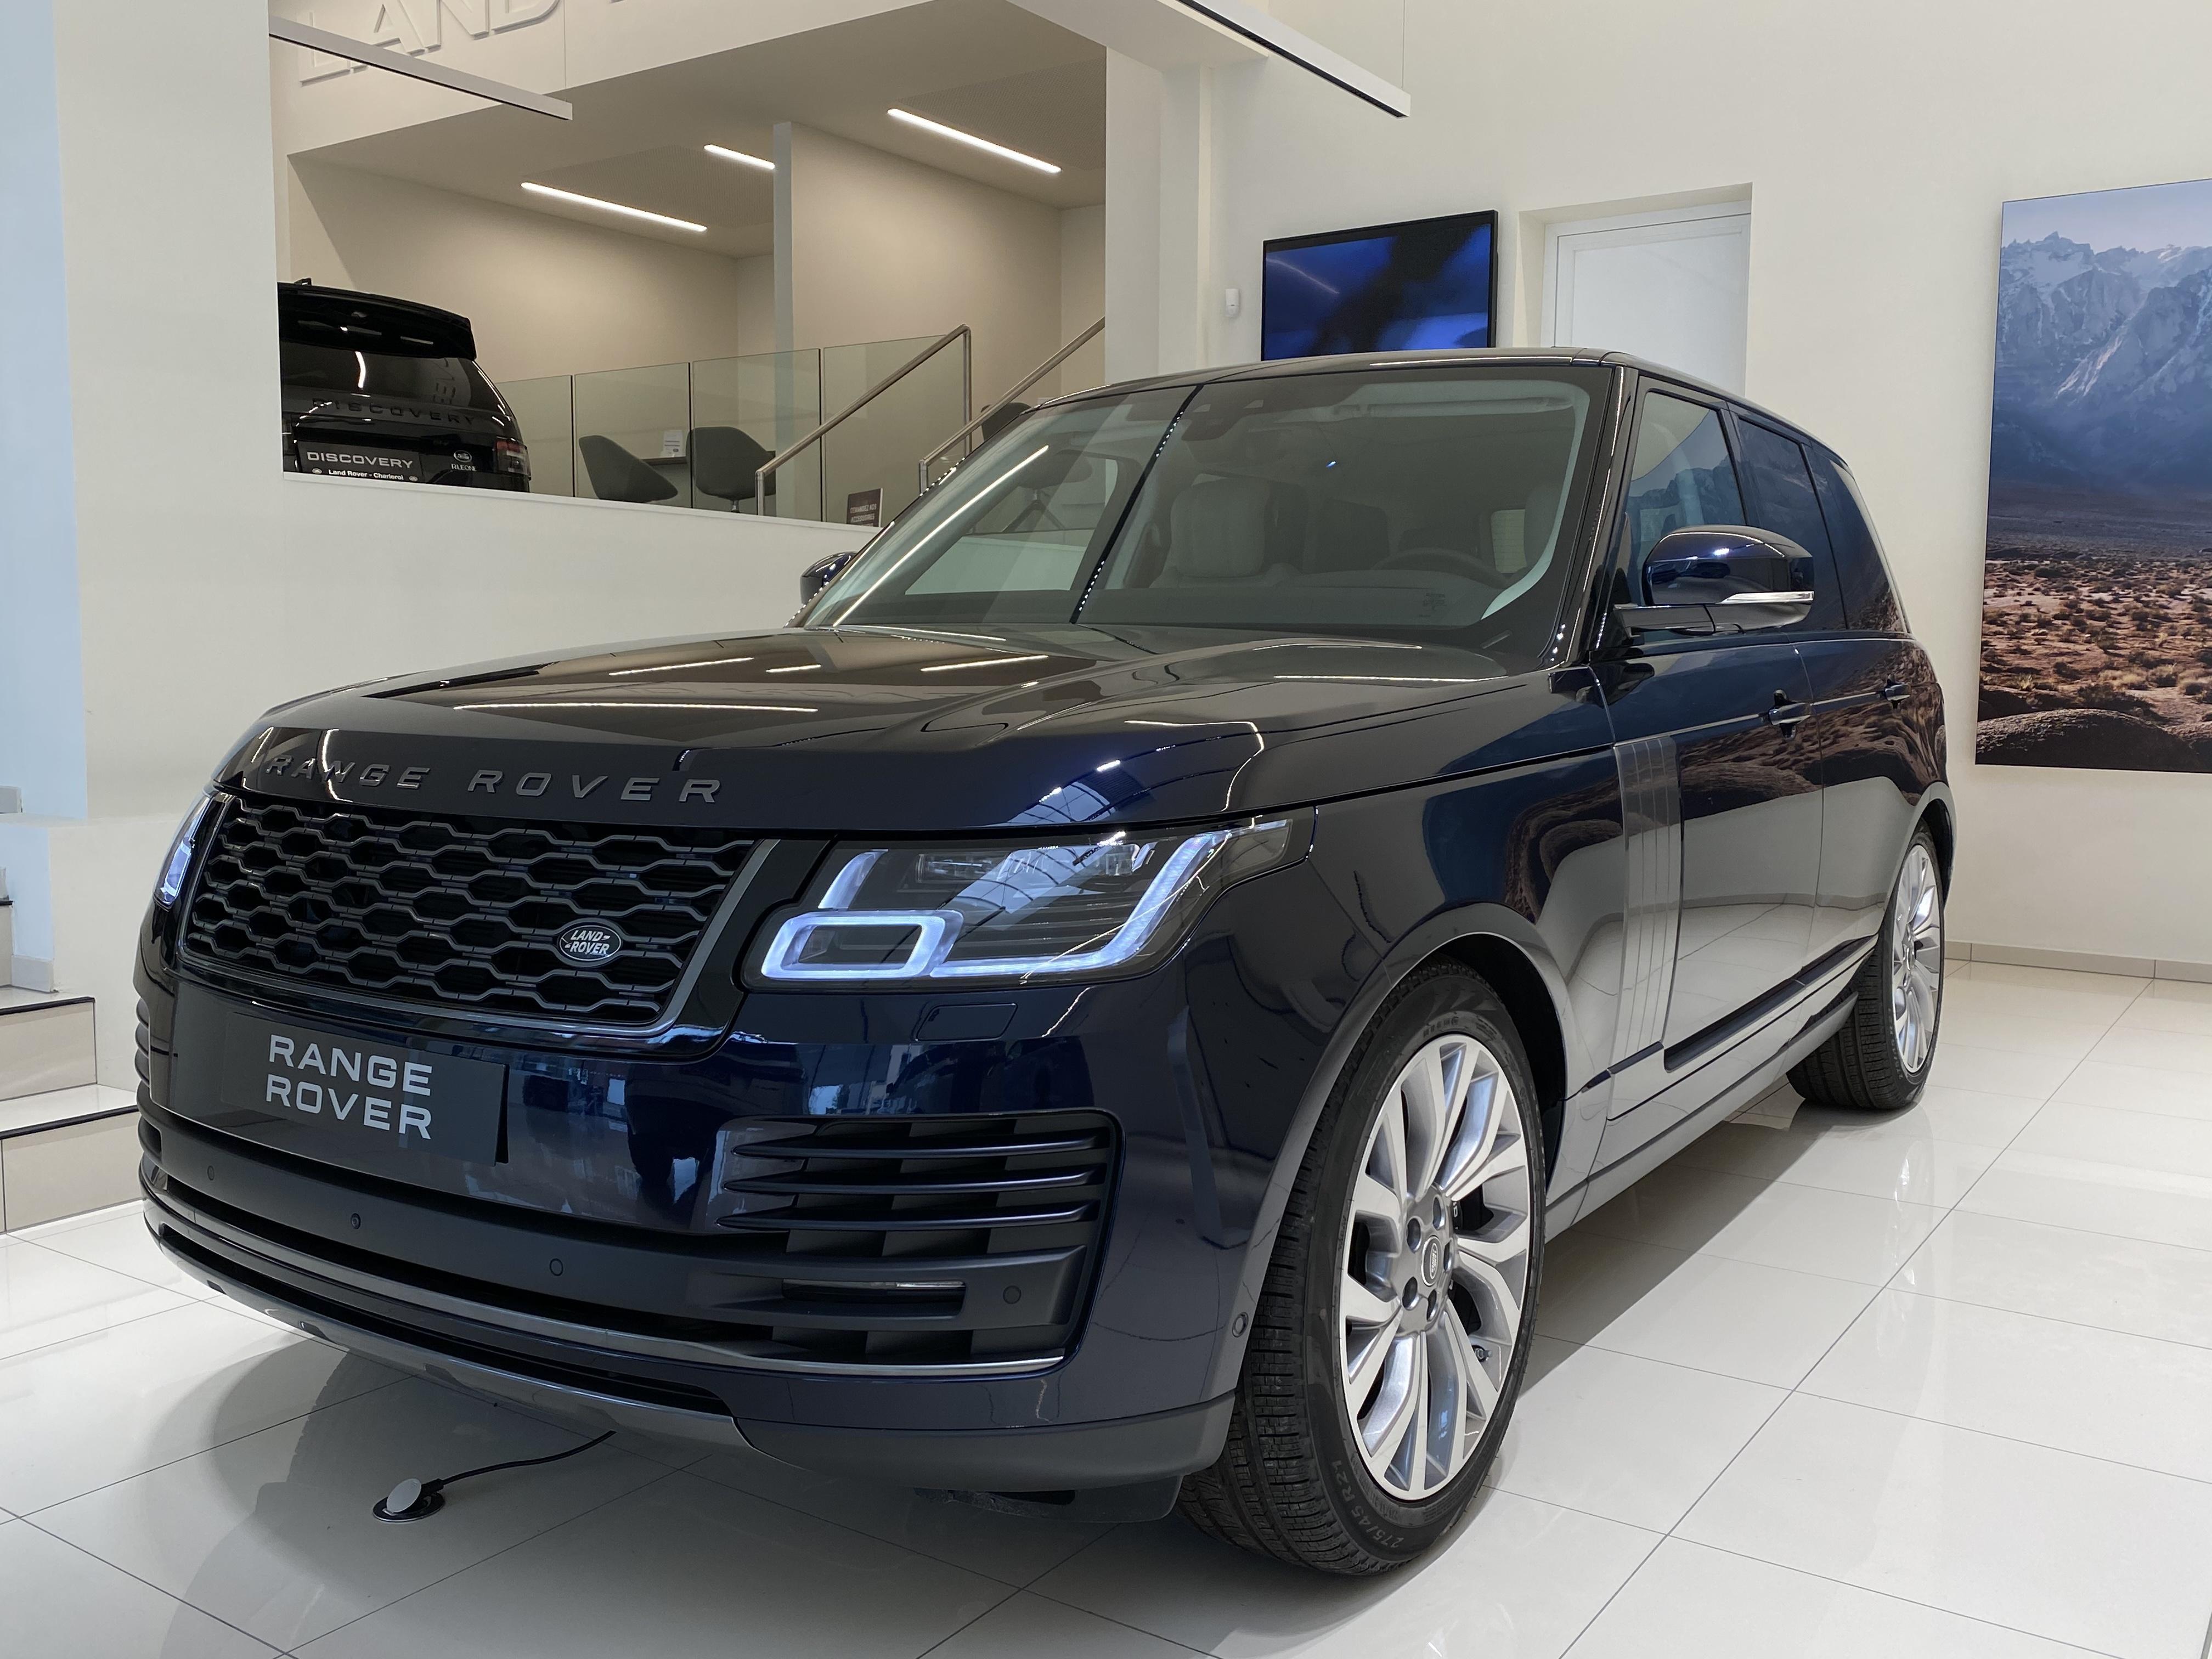 Land Rover Range Rover Vogue Limited Edition  -23% av